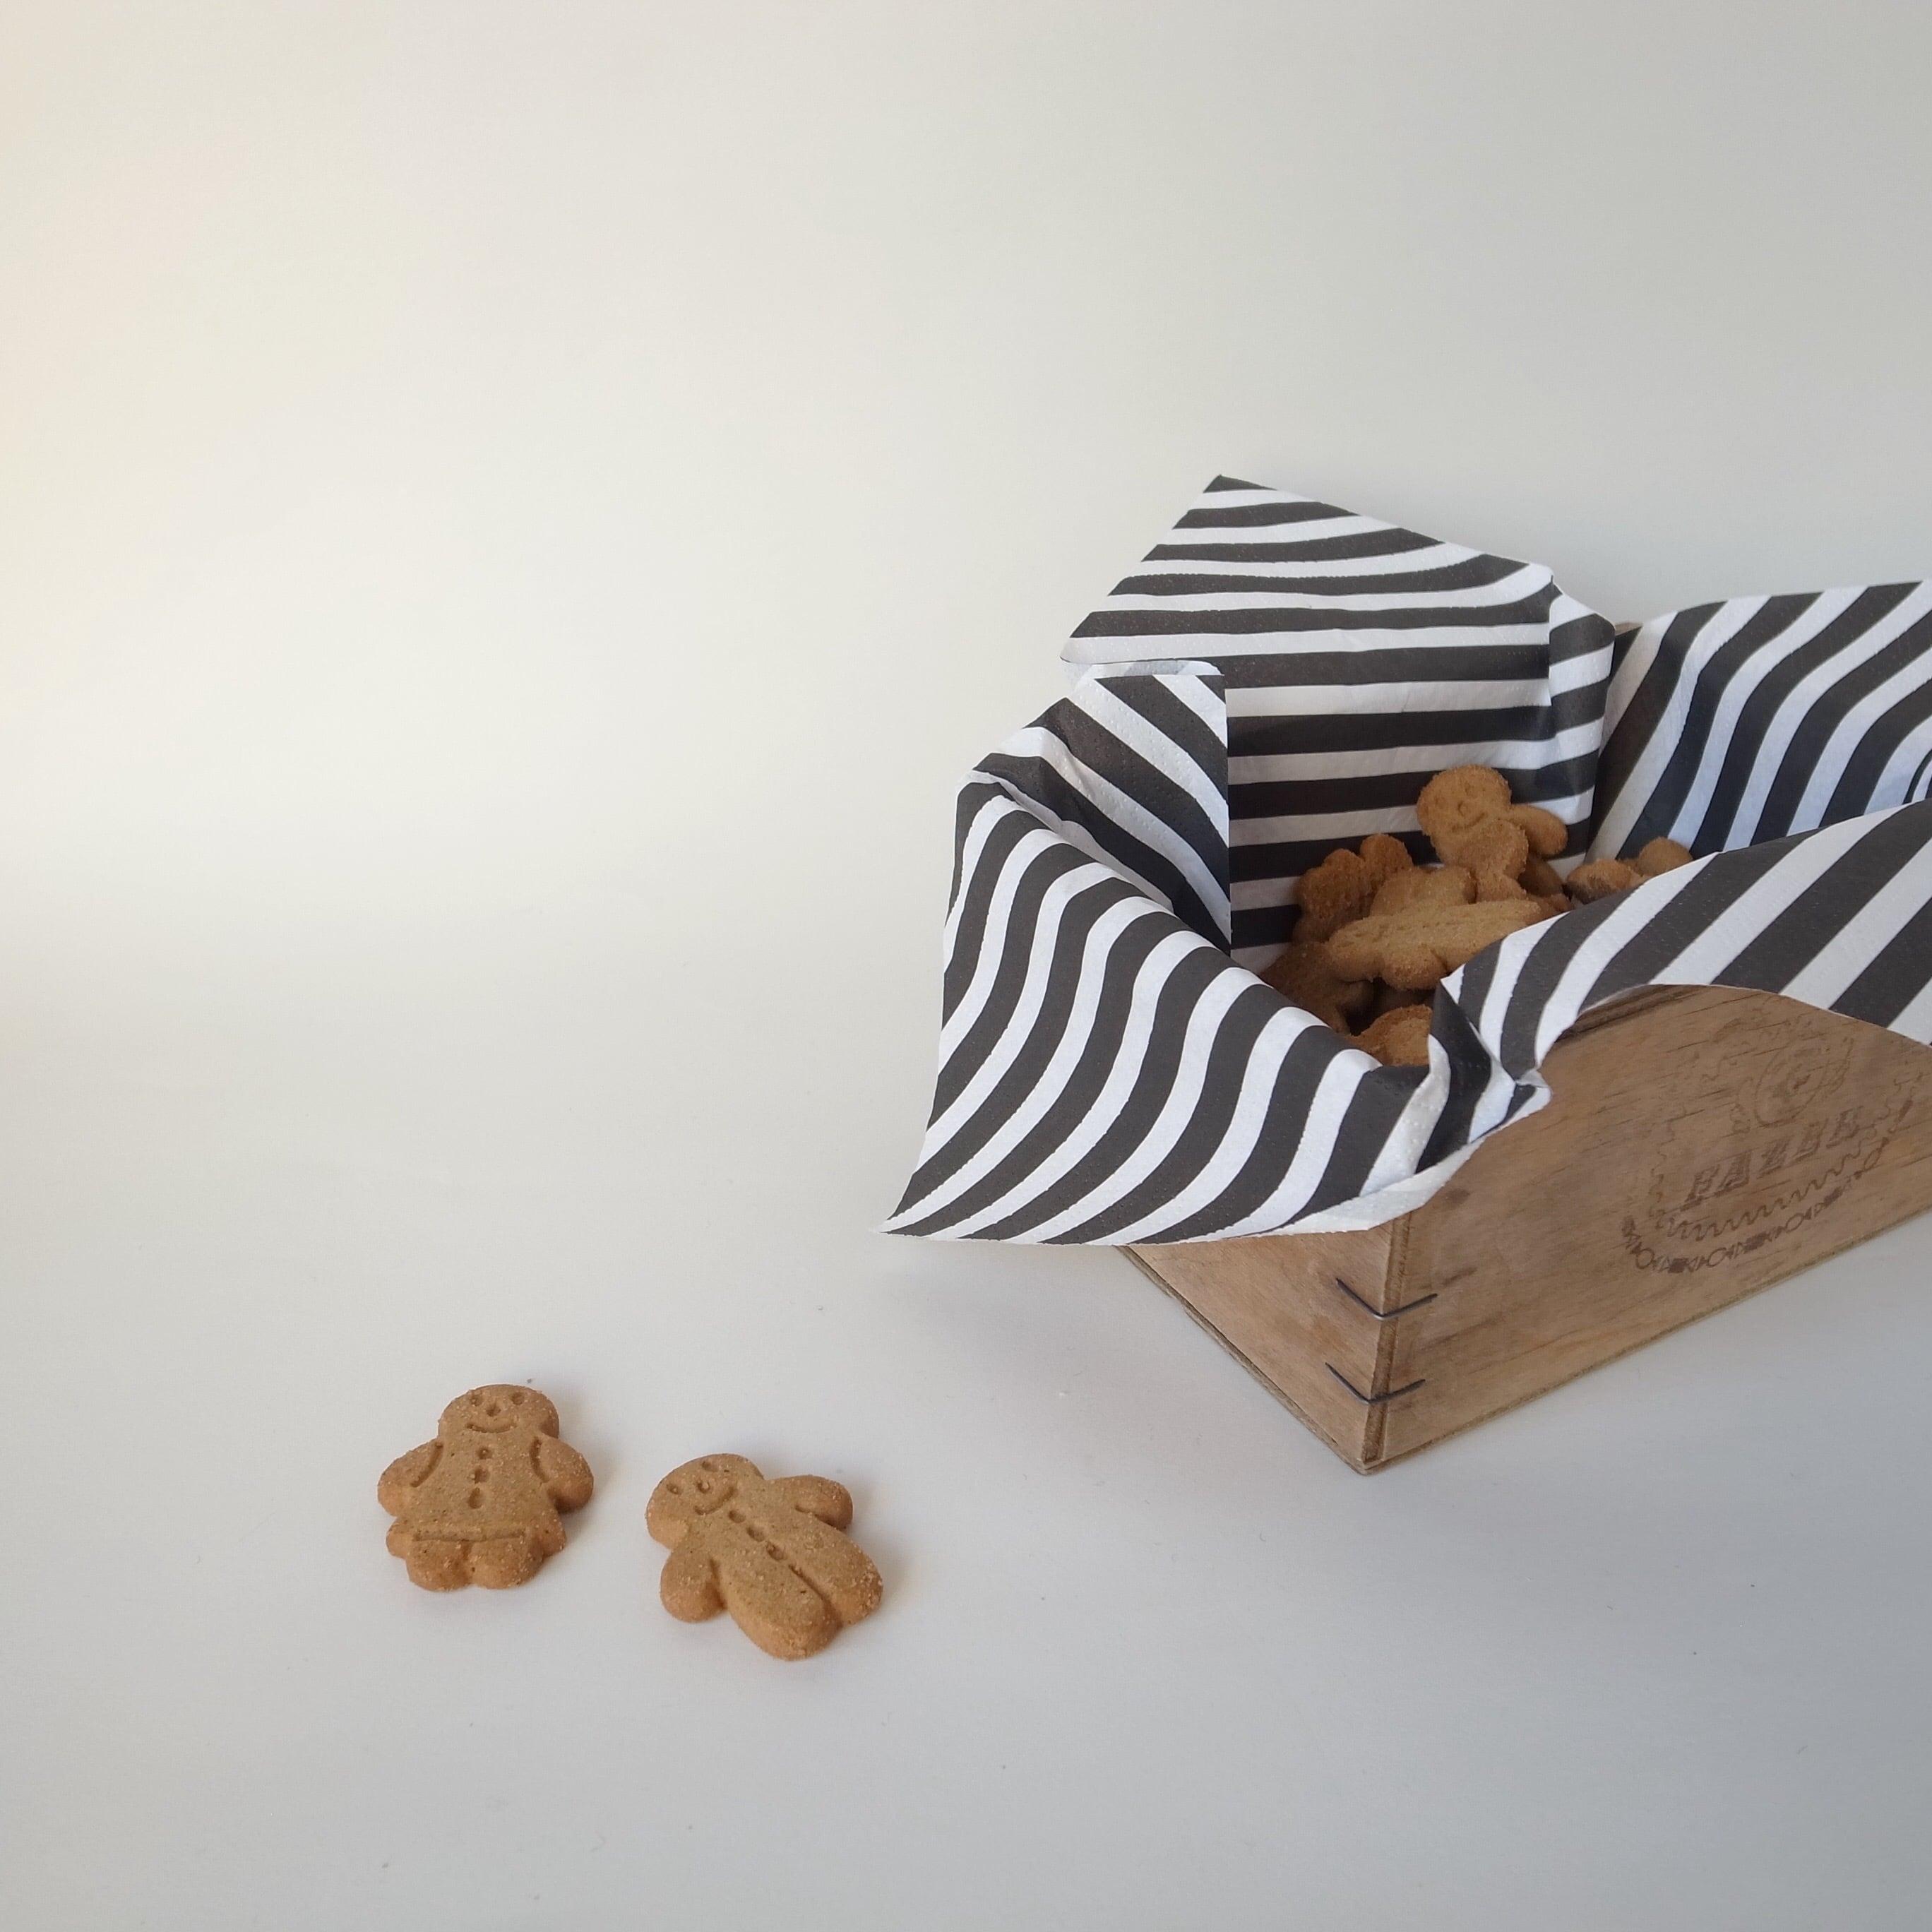 Fazer社のお菓子の木箱